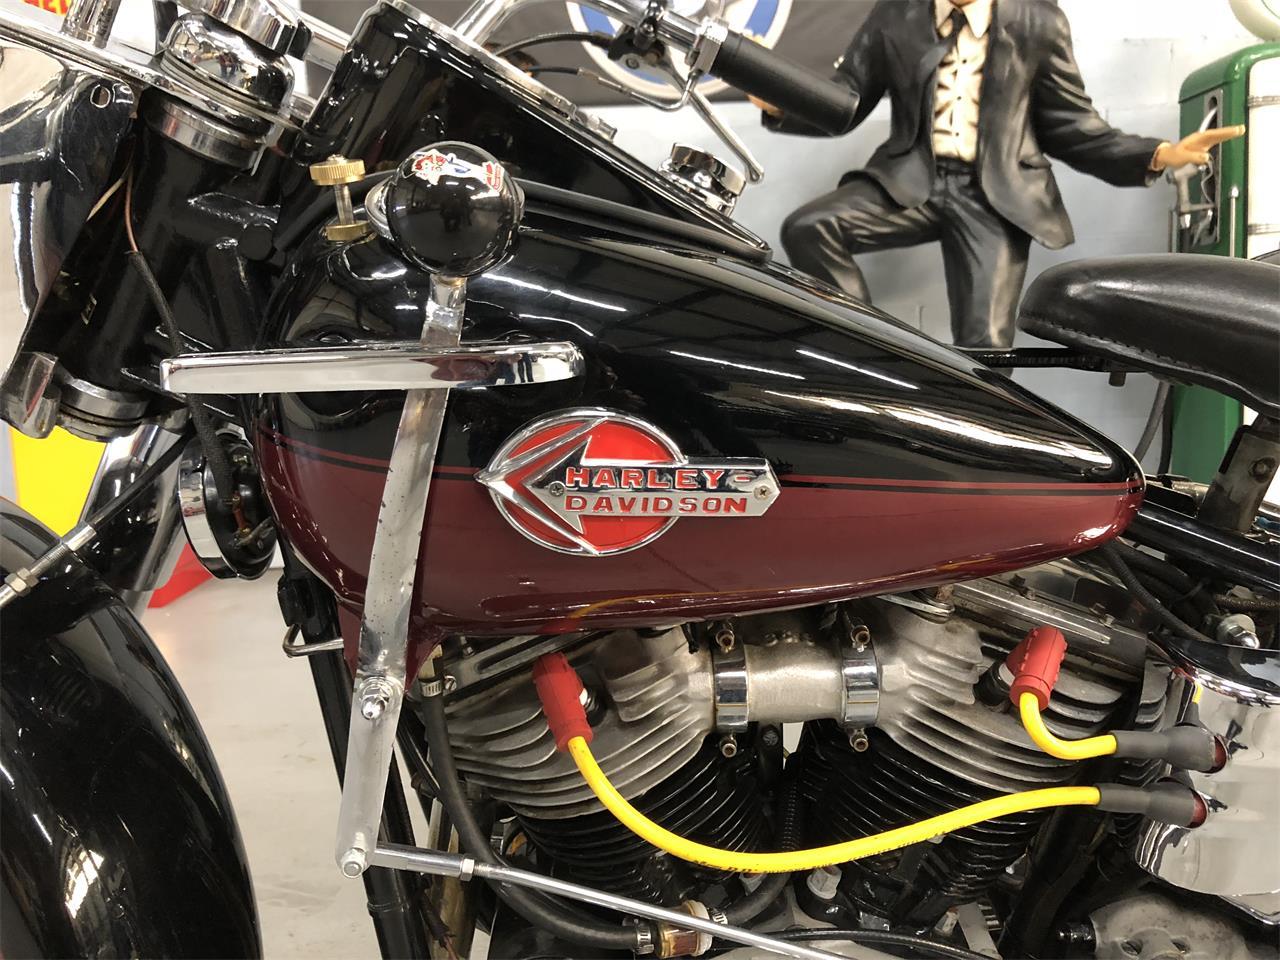 For Sale: 1959 Harley-Davidson Motorcycle in North Royalton, Ohio